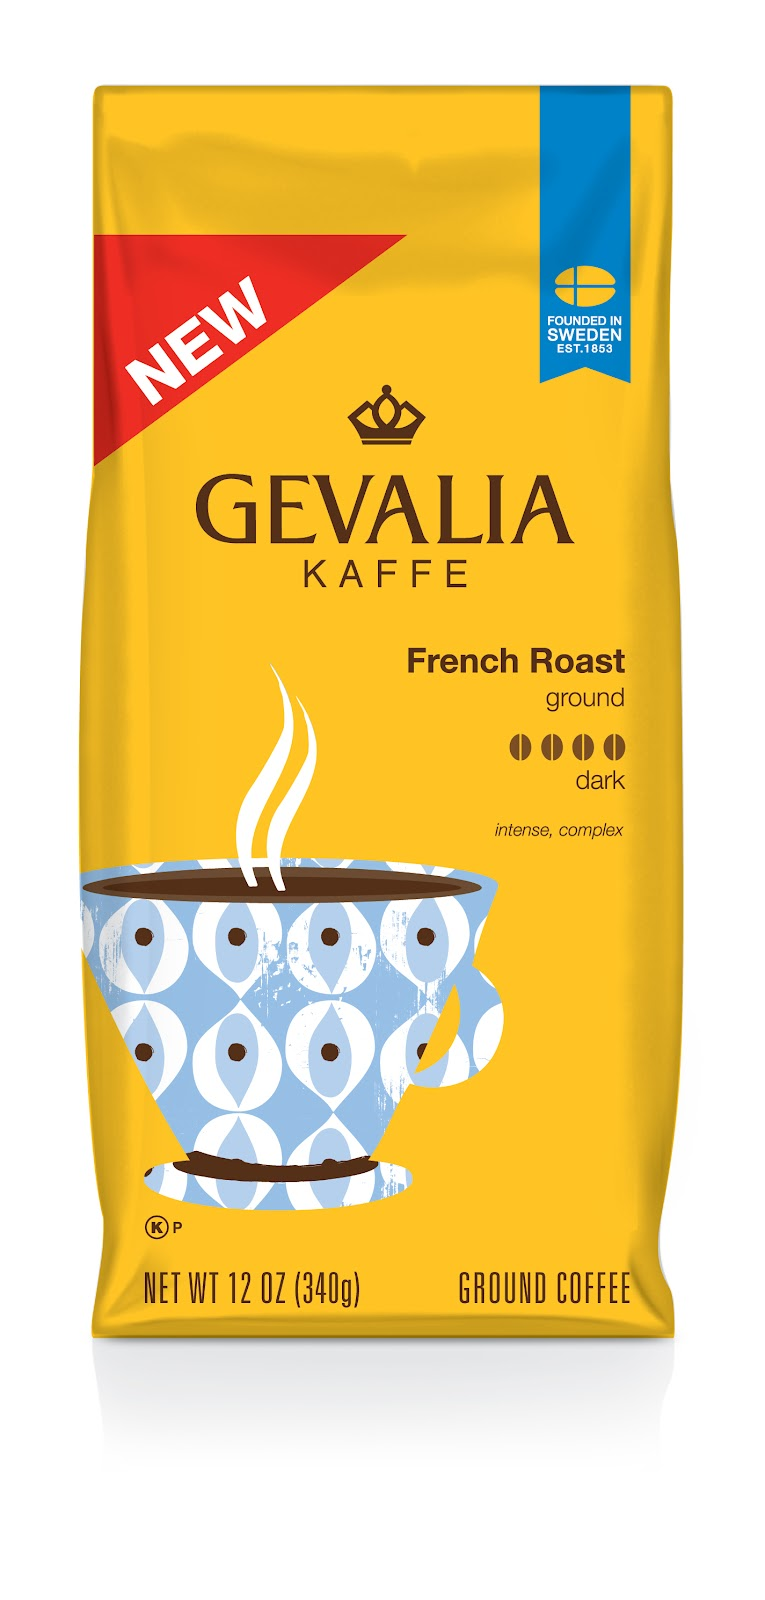 A Simple Kinda Life: Review and Giveaway: Gevalia Kaffee